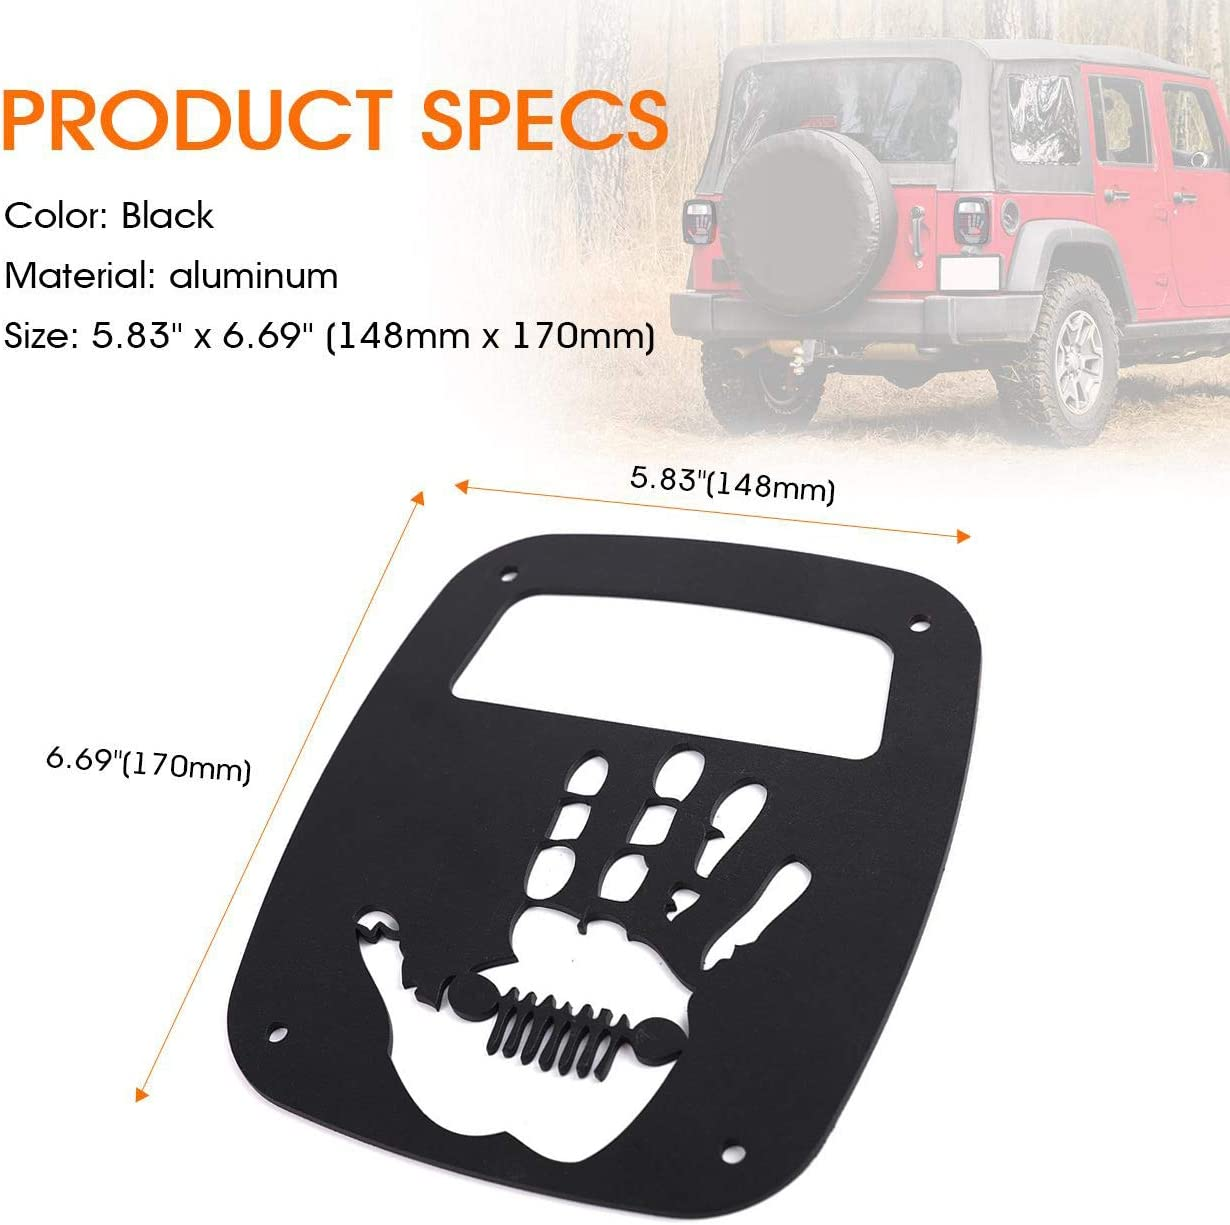 Light & Lighting Accessories Palm Partol Black Exterior Rear Tail ...